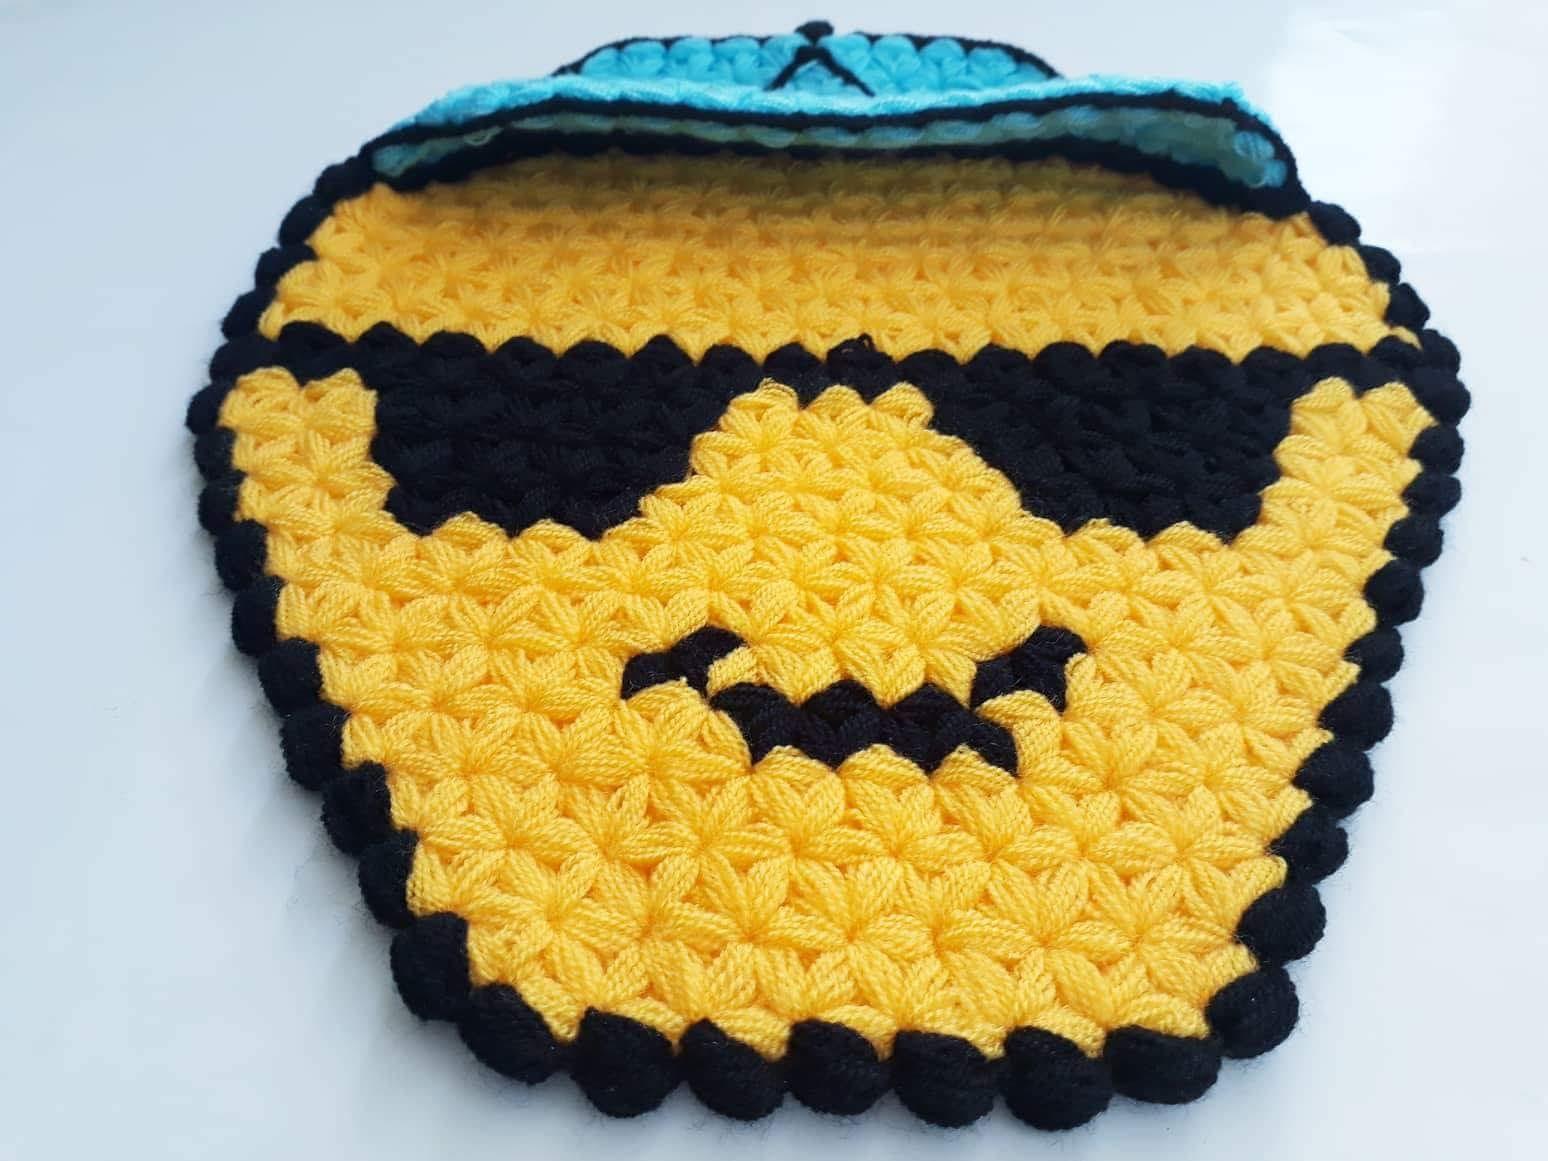 amigurumi crochet patterns free download - craftIdea.org ... | 1161x1548